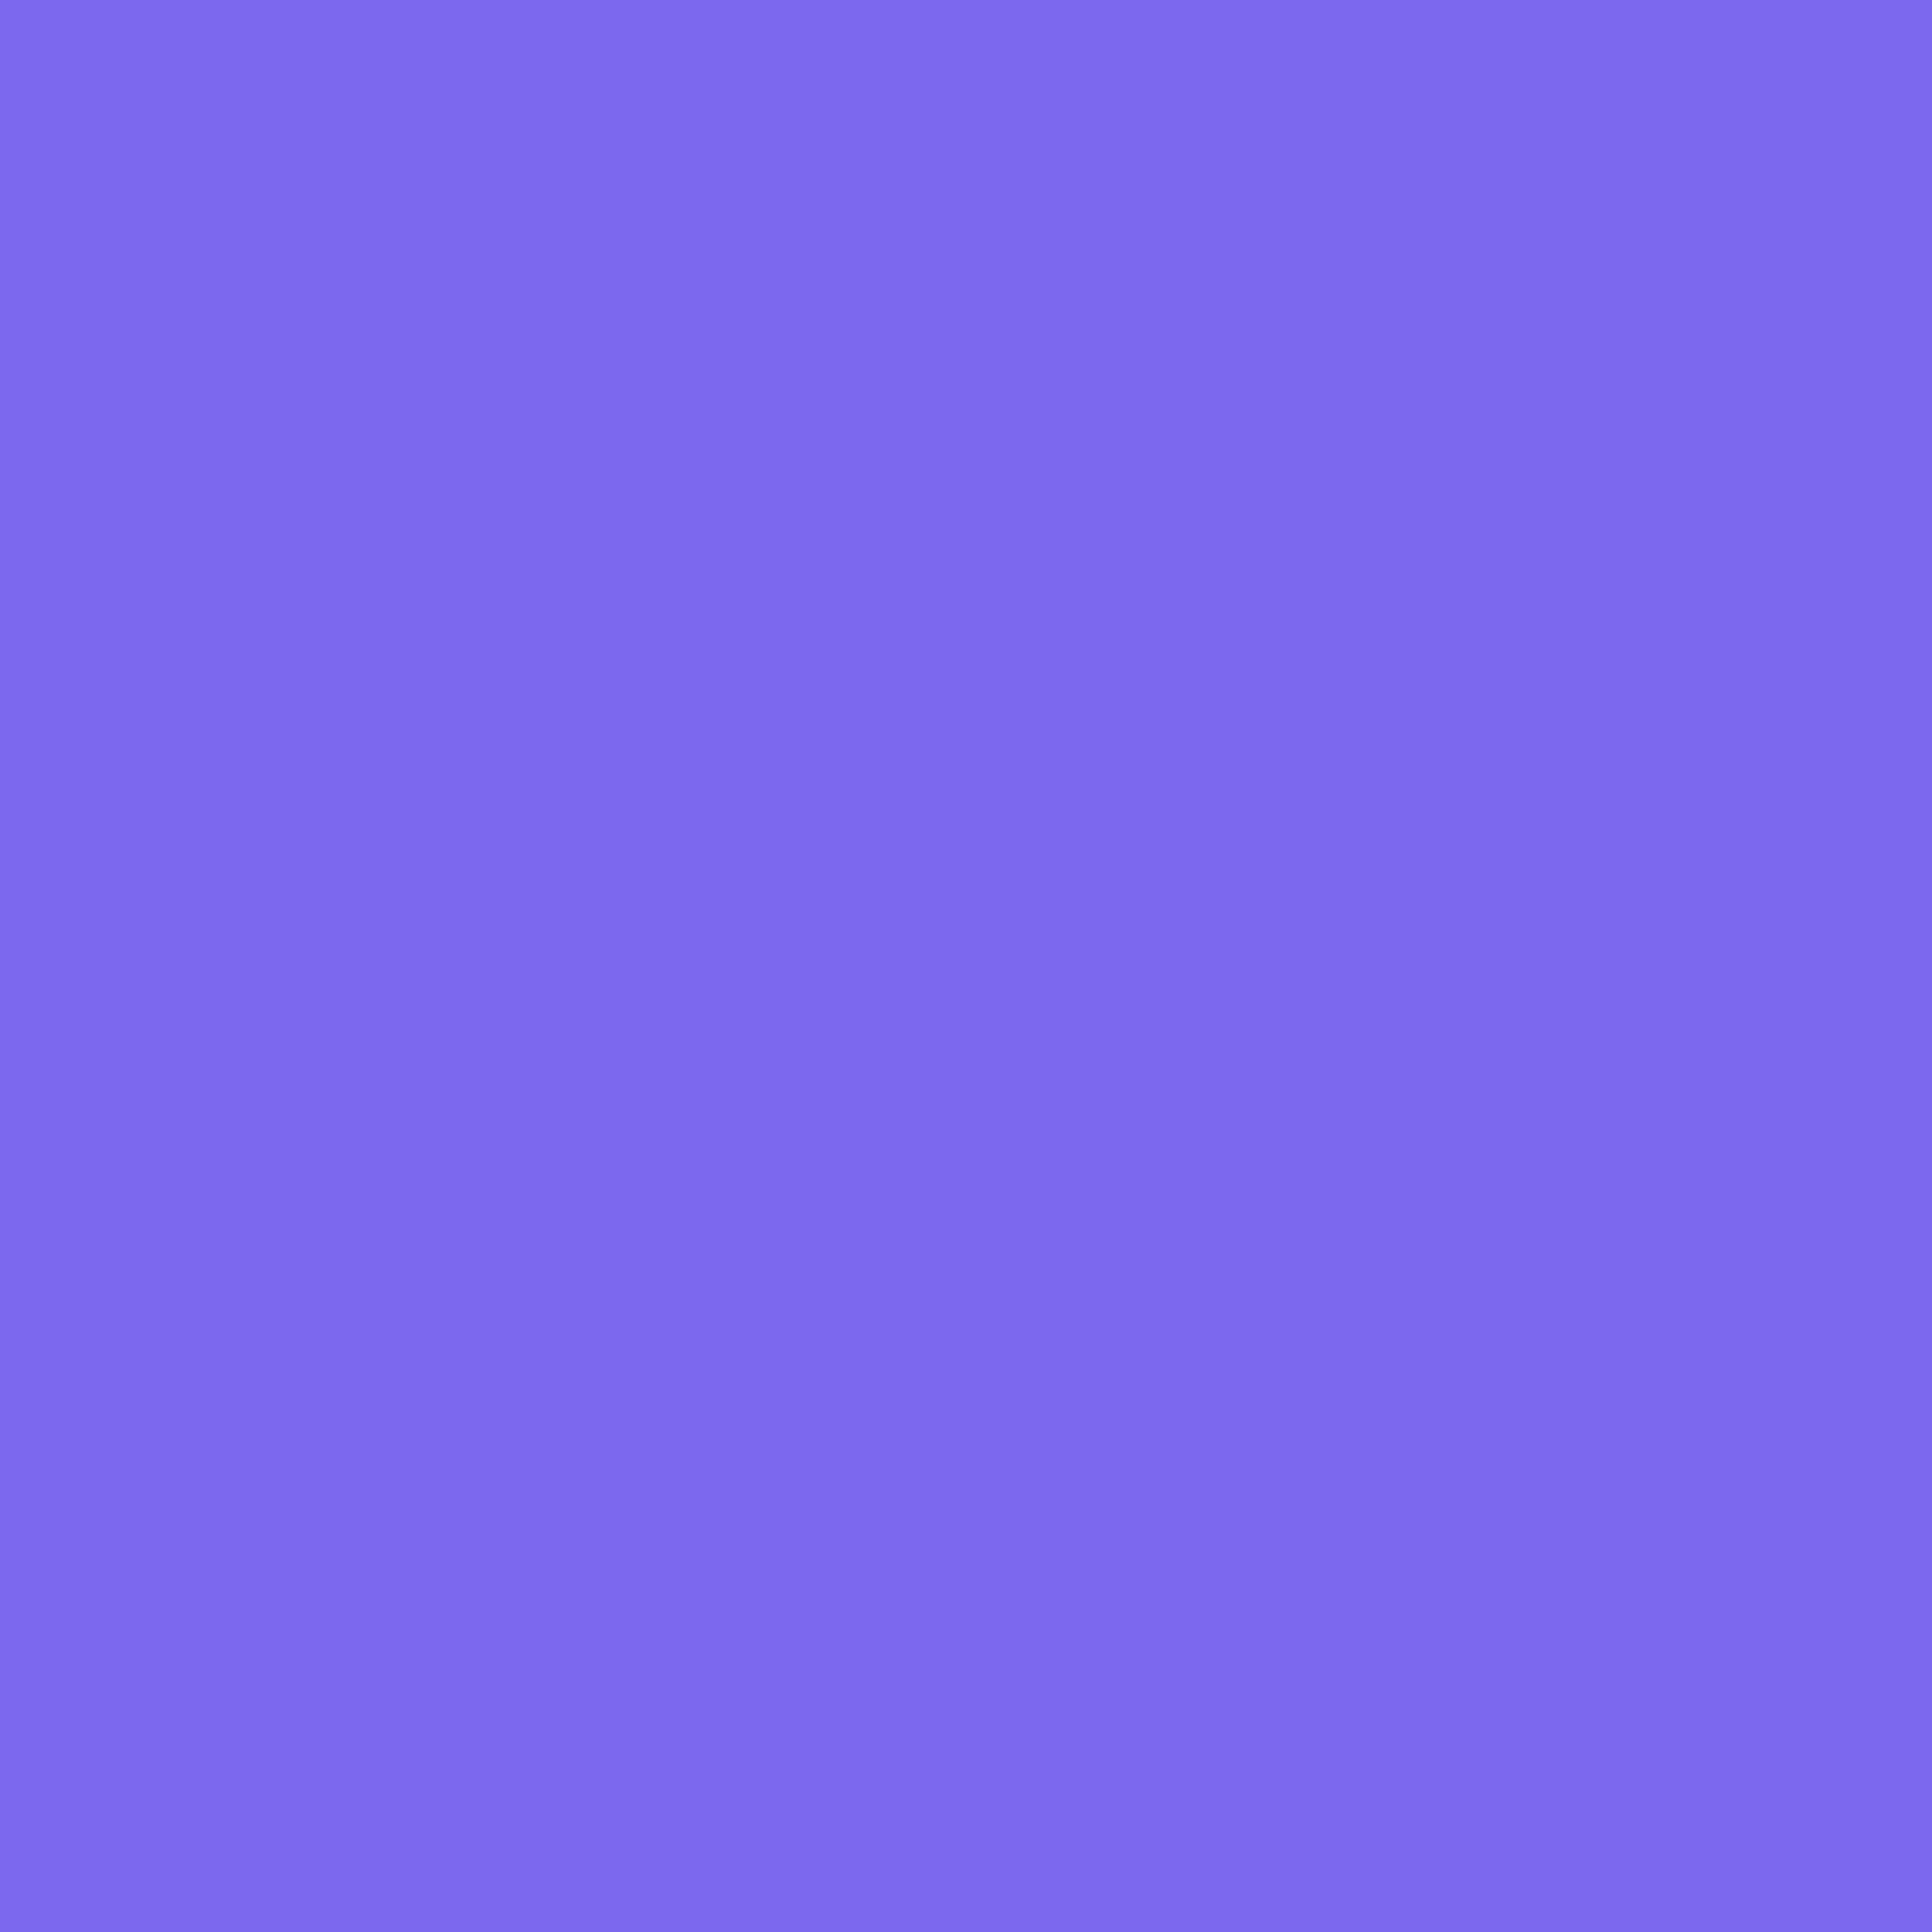 2048x2048 Medium Slate Blue Solid Color Background